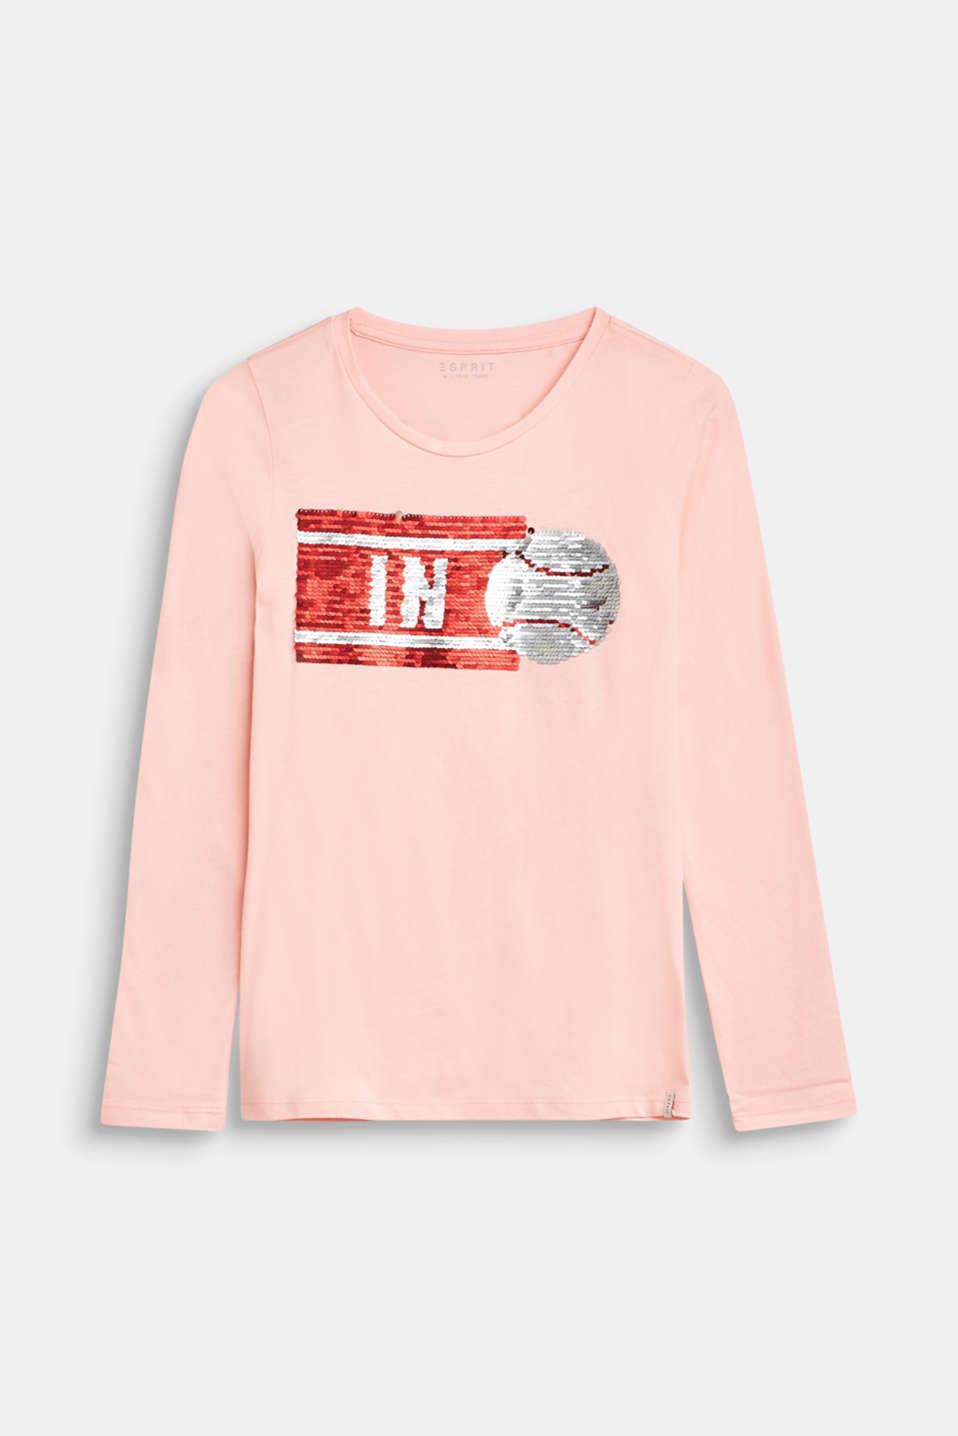 T-Shirts, LCTINTED ROSE, detail image number 0